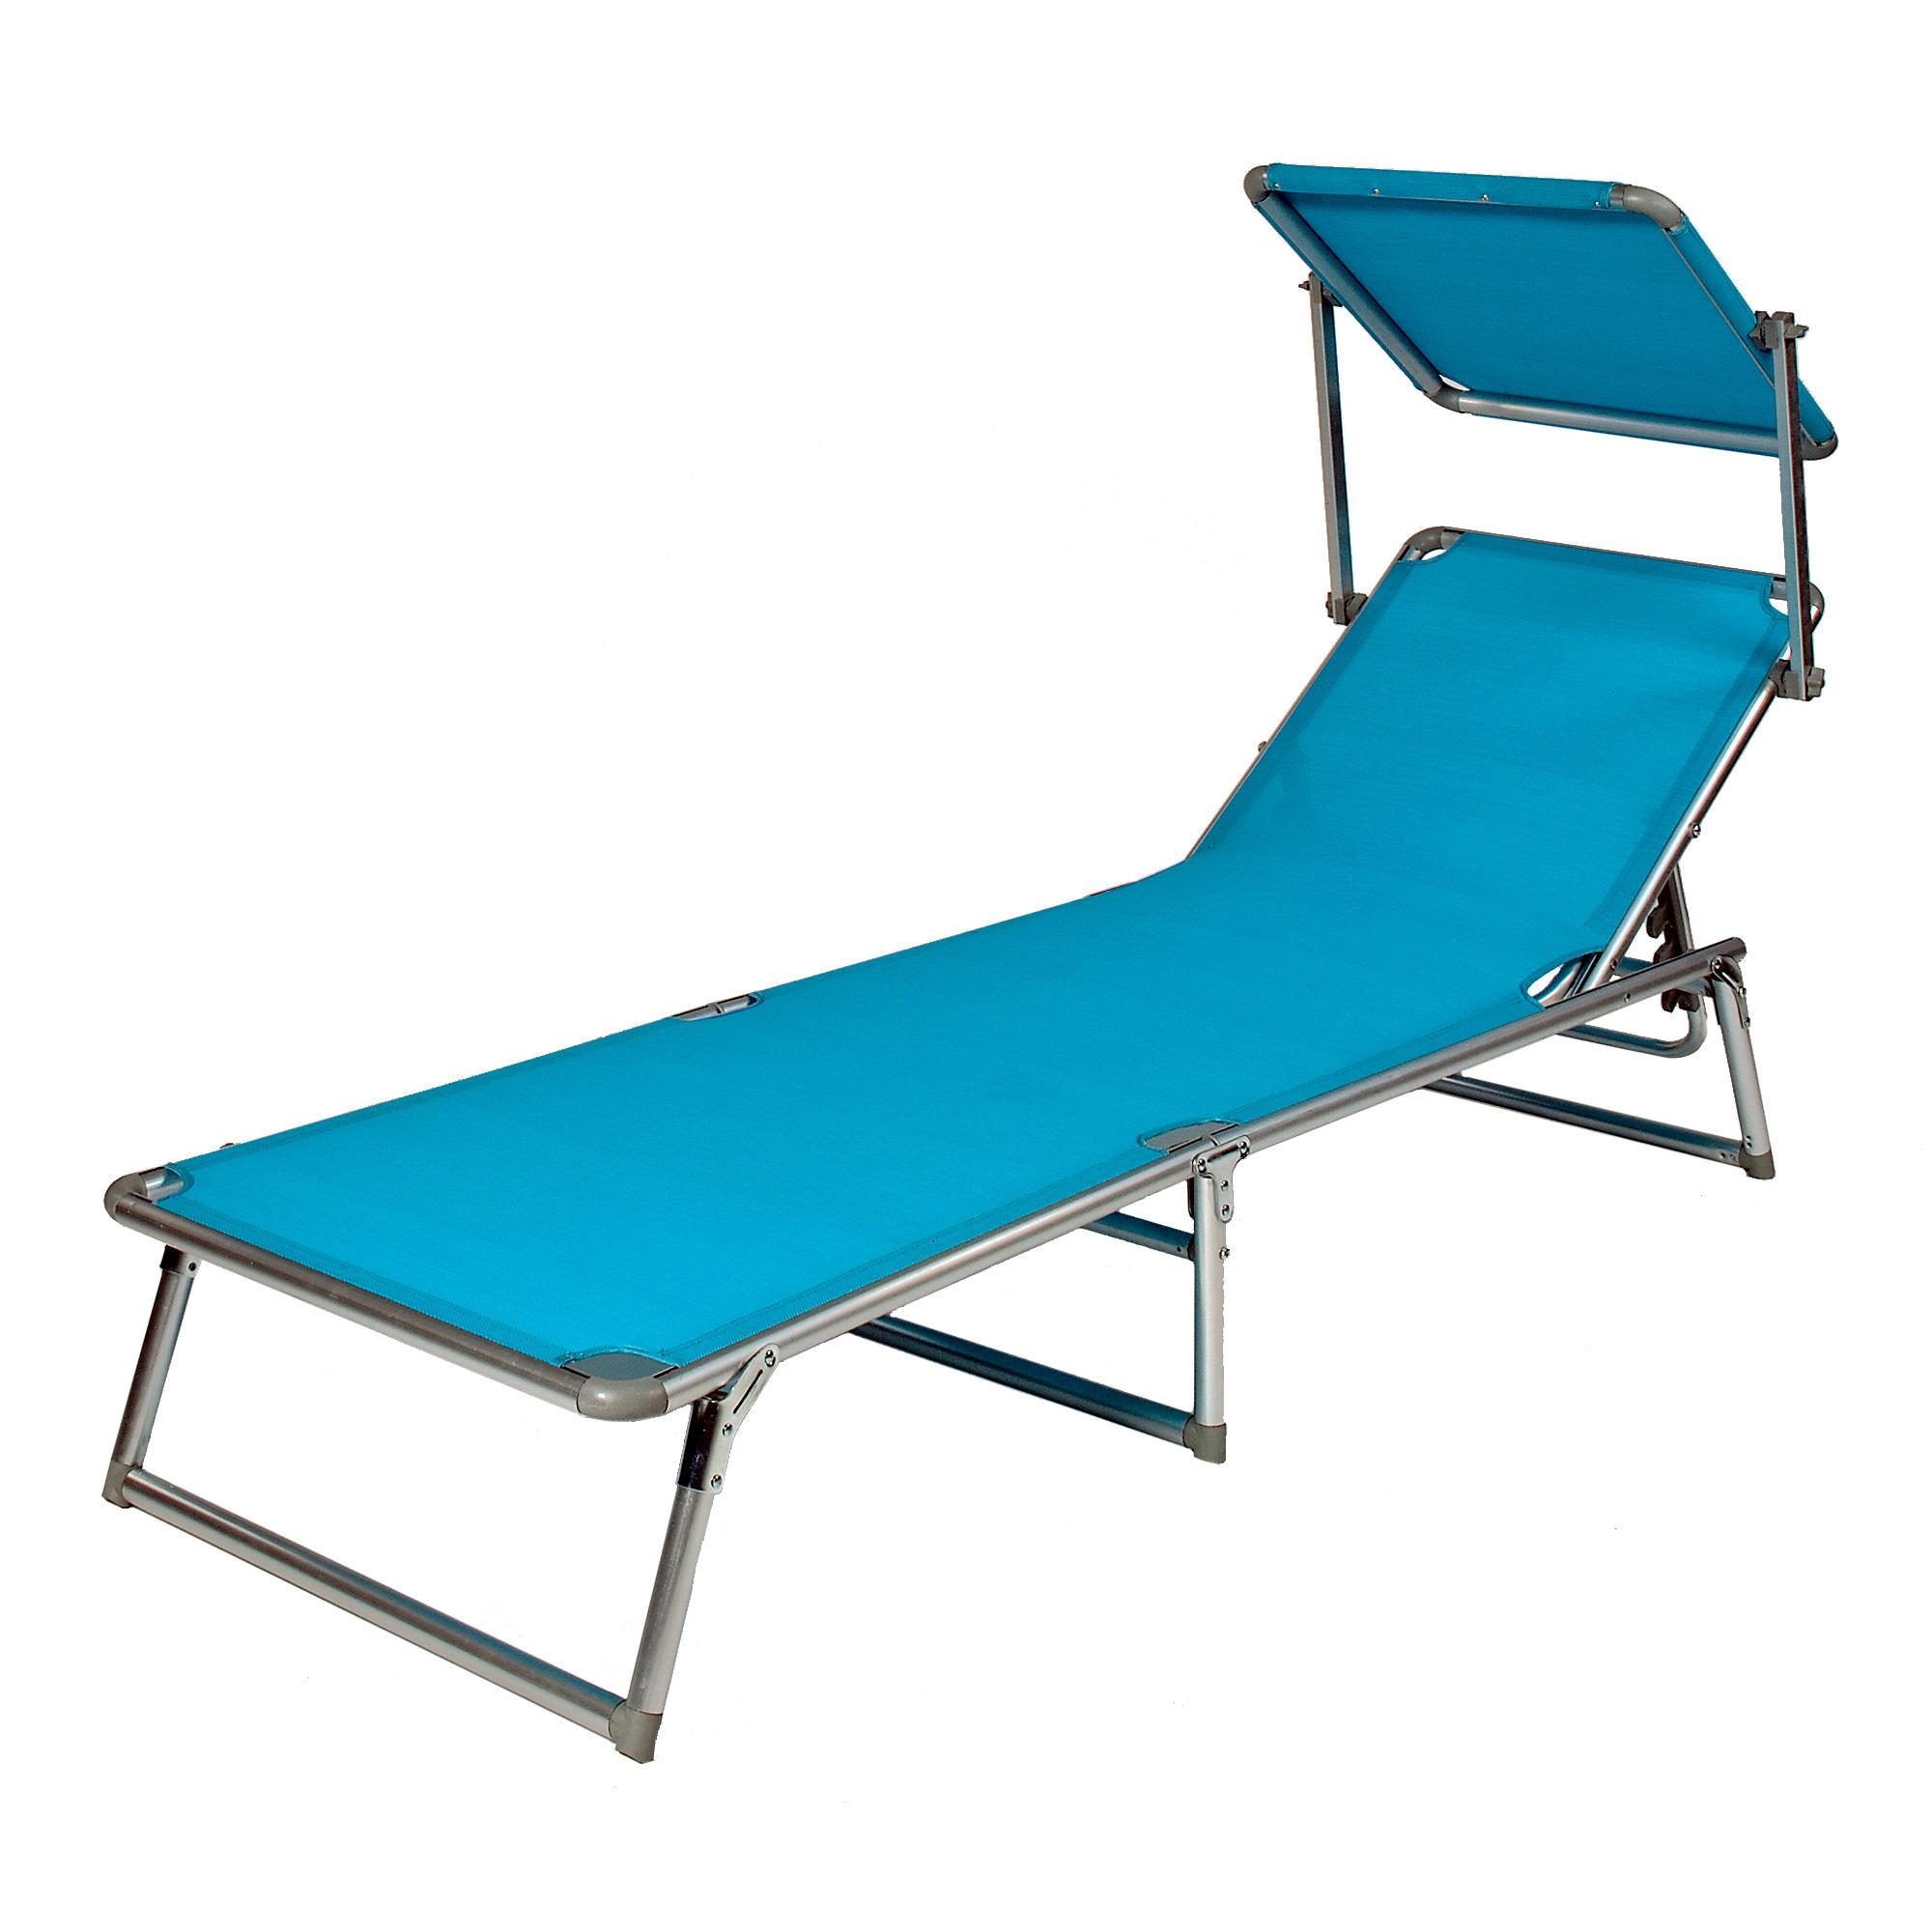 Soleil Camping Avec Unigro Chaise Pare be Voyageamp; Longue 7gvbfyY6